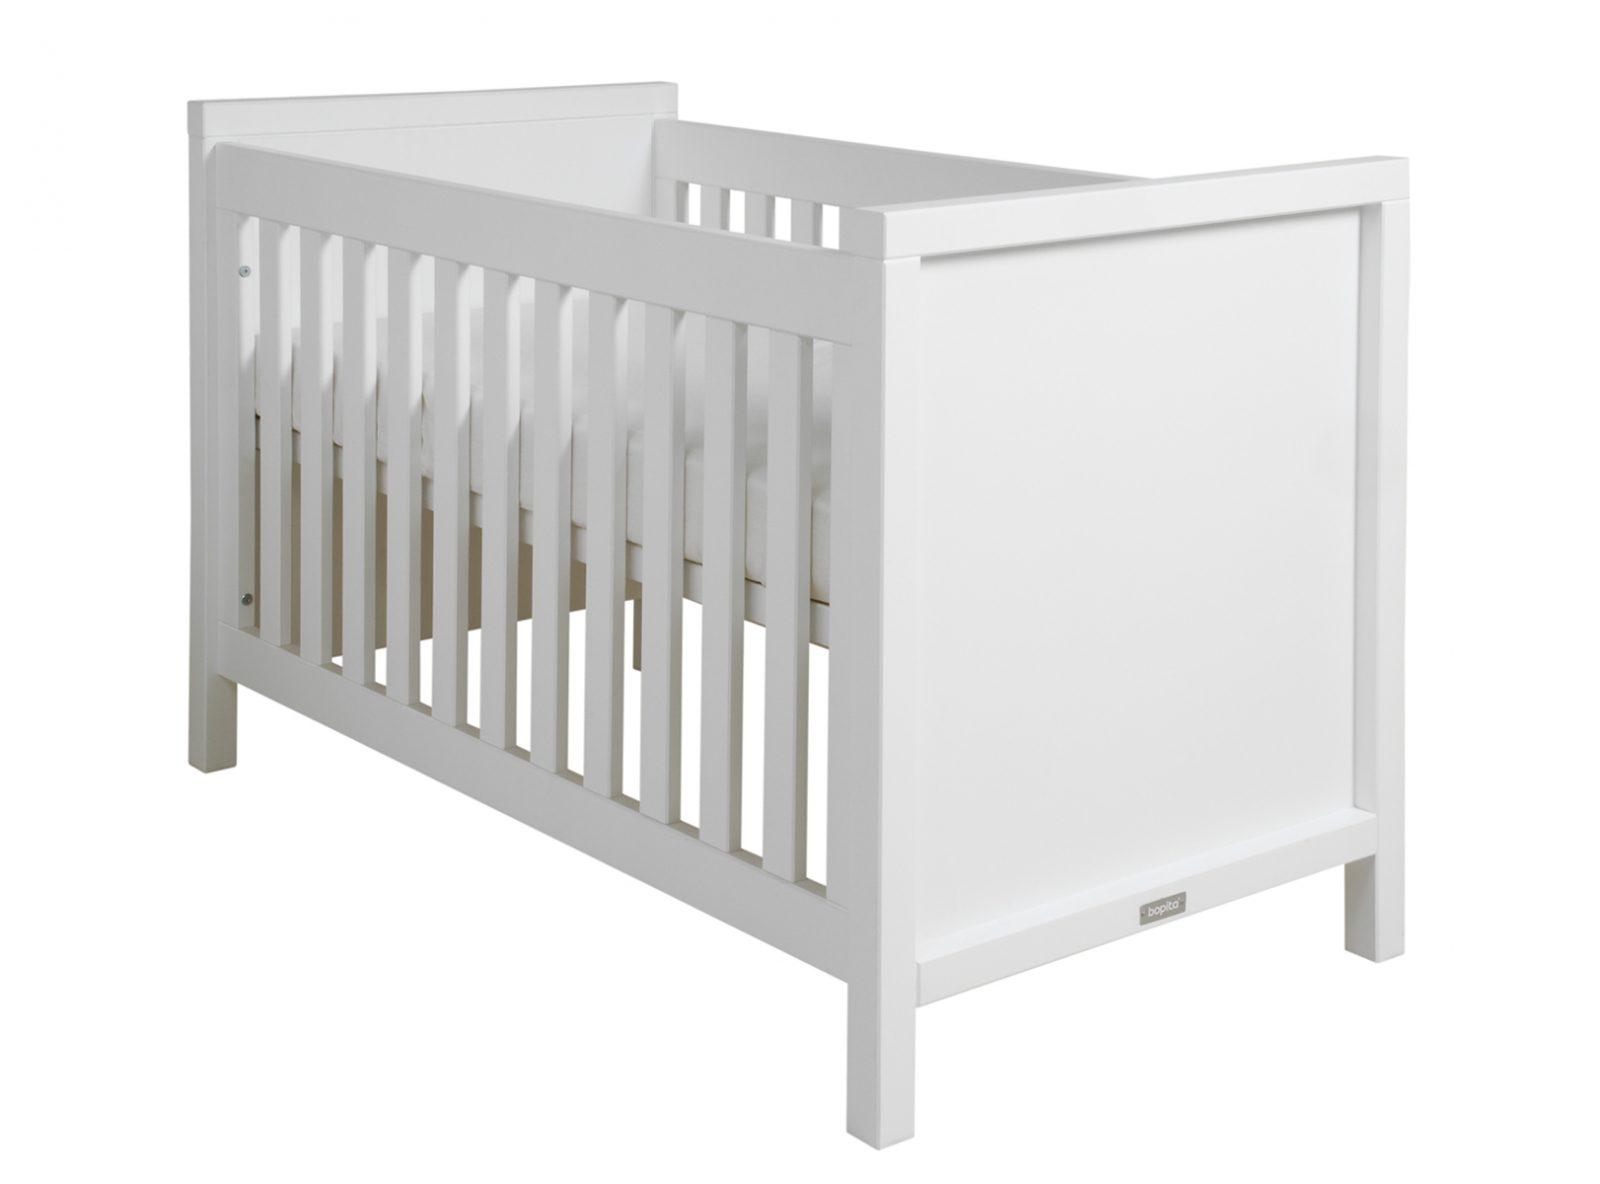 Hoogte Ledikant Baby.Bopita Corsica Ledikant 60 X 120 Cm